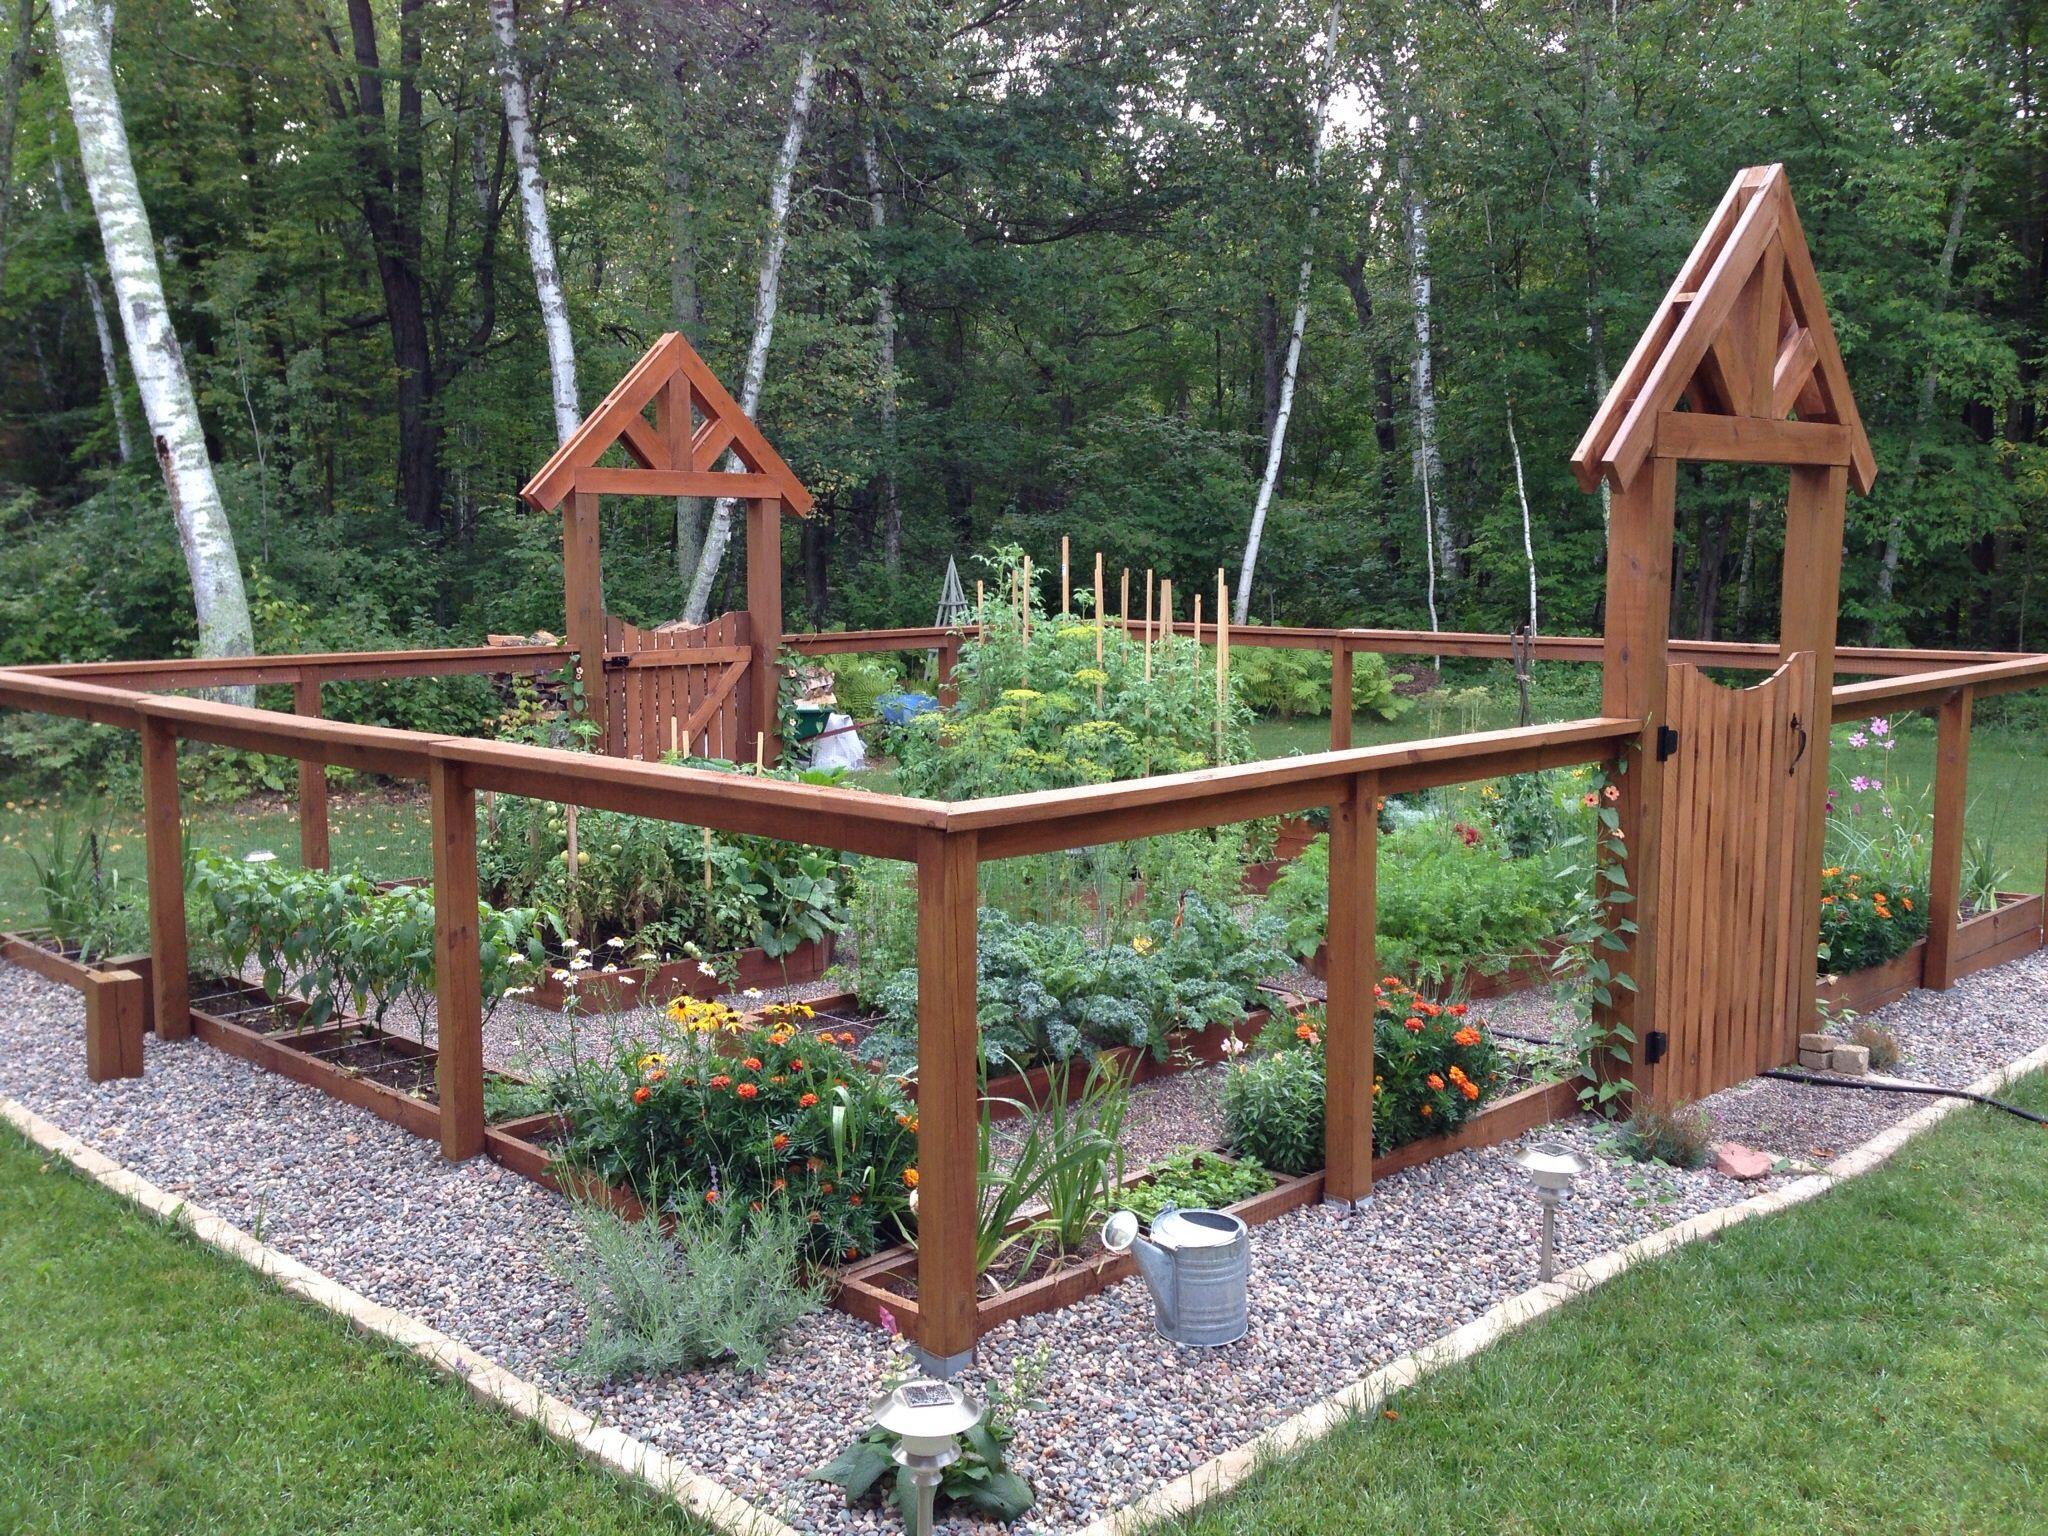 Pin by charmaine hansen on deer proof gardens pinterest - Deer proof vegetable garden ideas ...